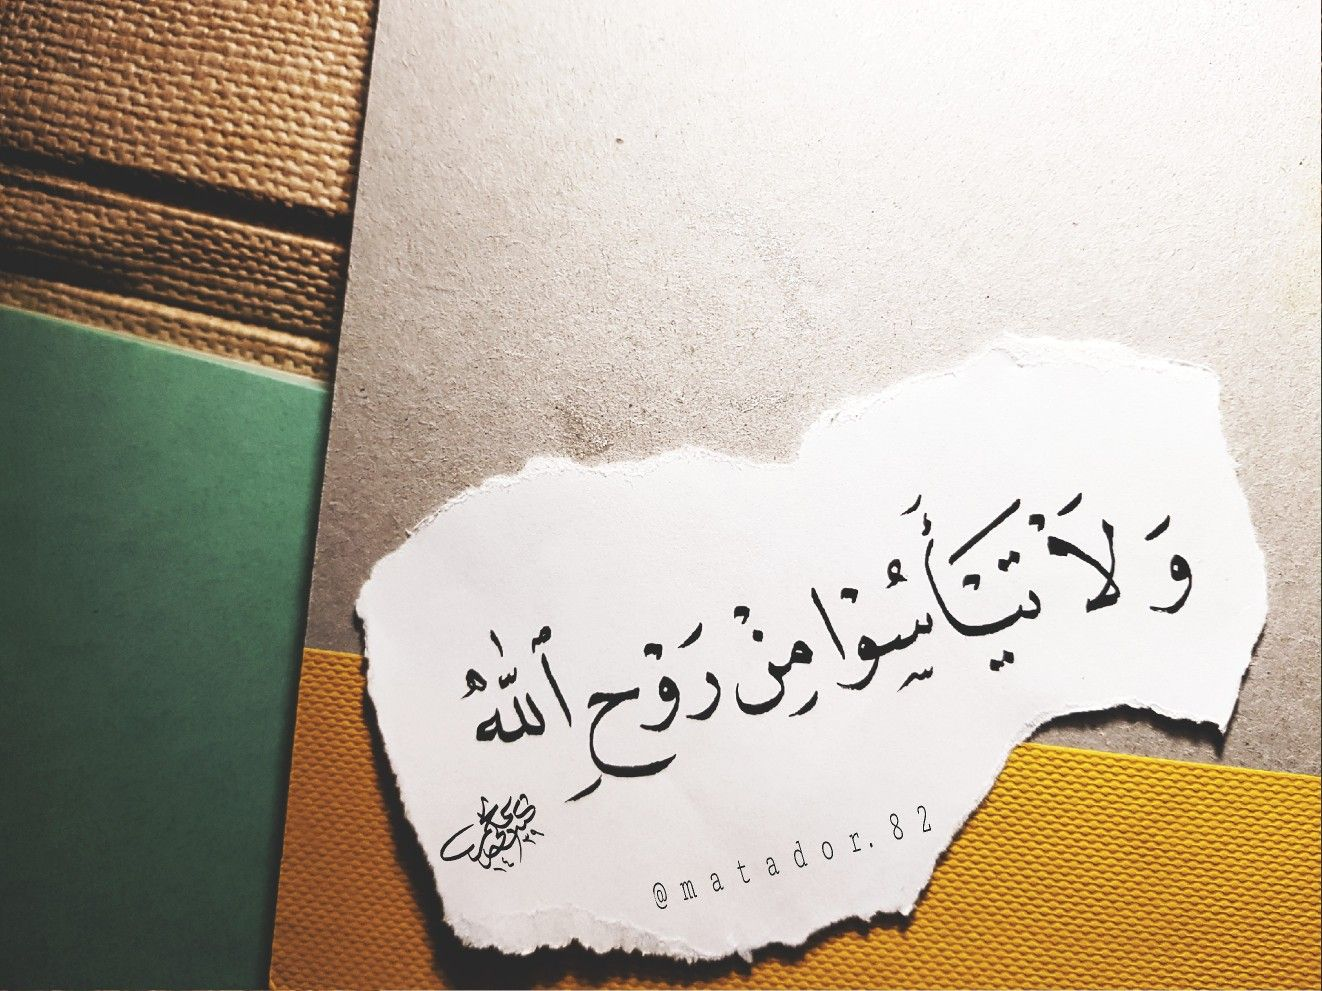 لا تيأسوا من روح الله العراق خط عربي Calligraphy I Scratchboard Art Arabic Quotes